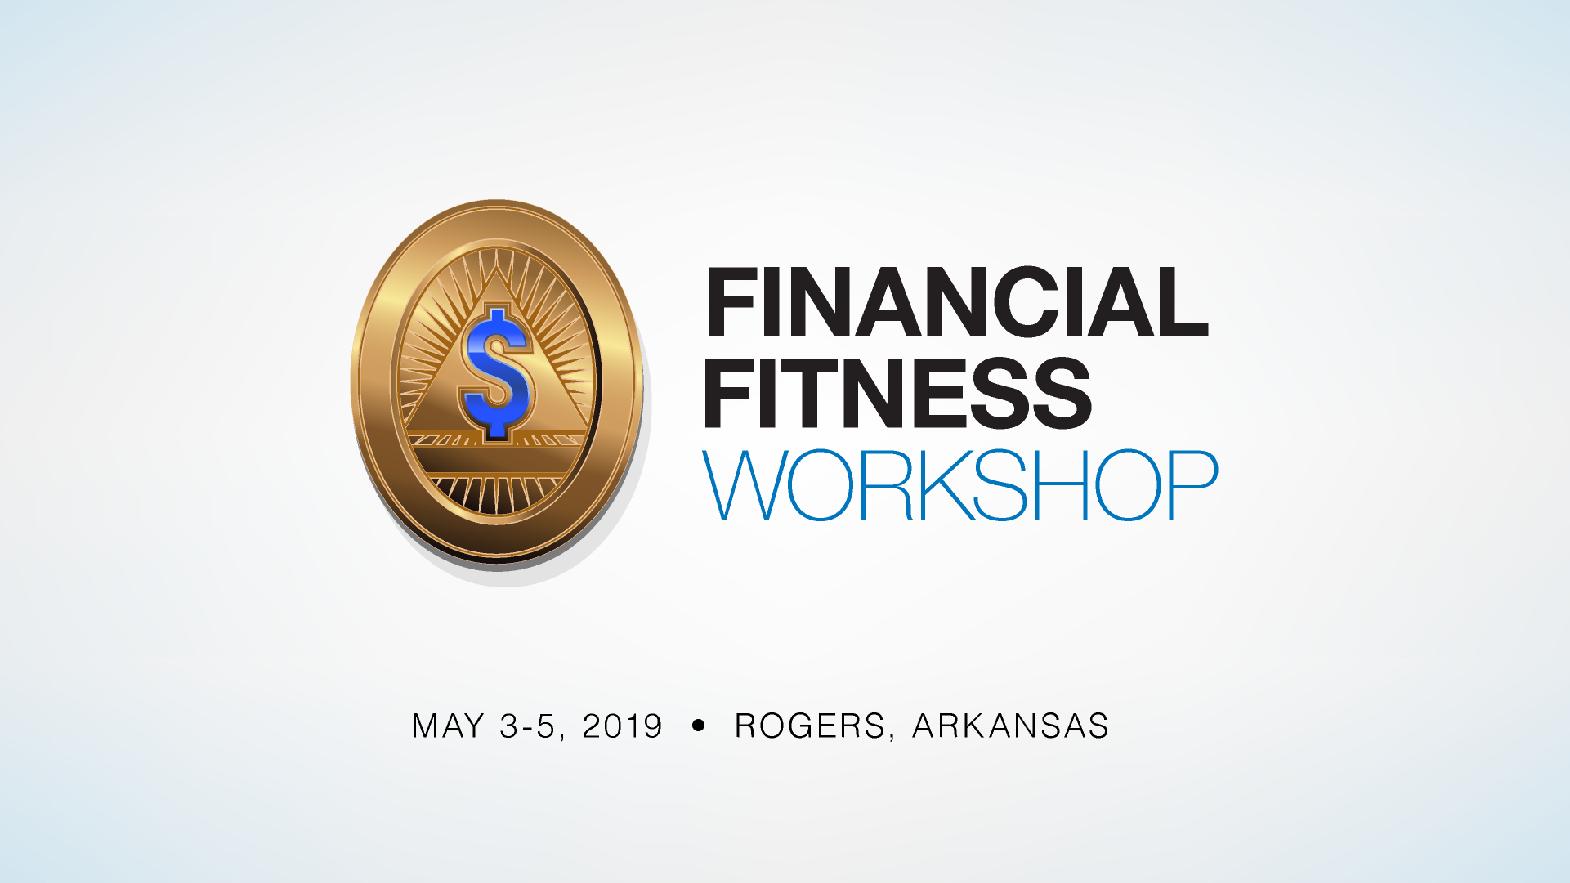 Financial Fitness Workshop | Morter Farm Rogers, Arkansas